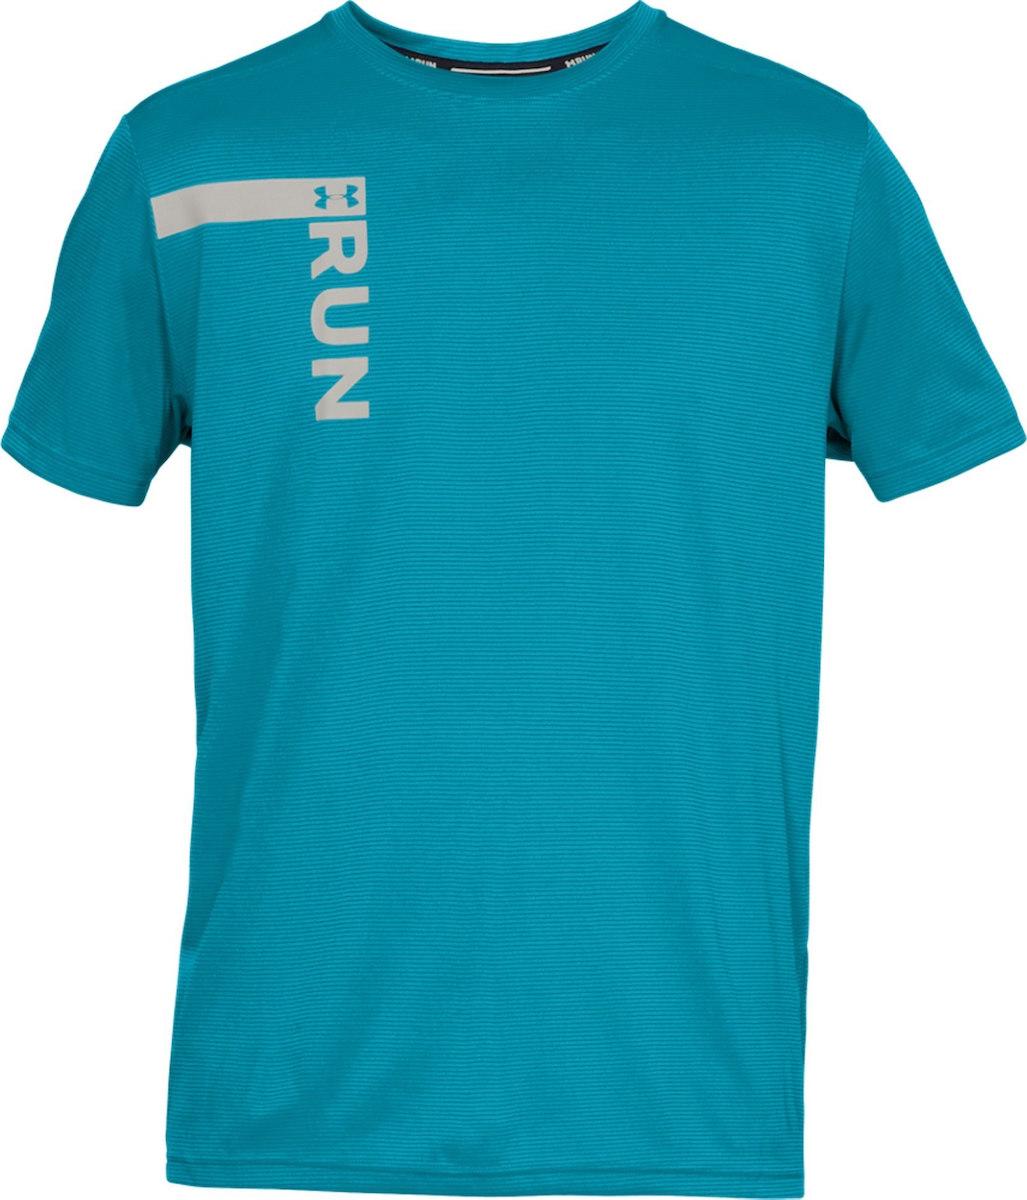 ddc0d8d58 Under Armour UA Run Tall Graphic Short Sleeve Blue - Ubrania męskie ...